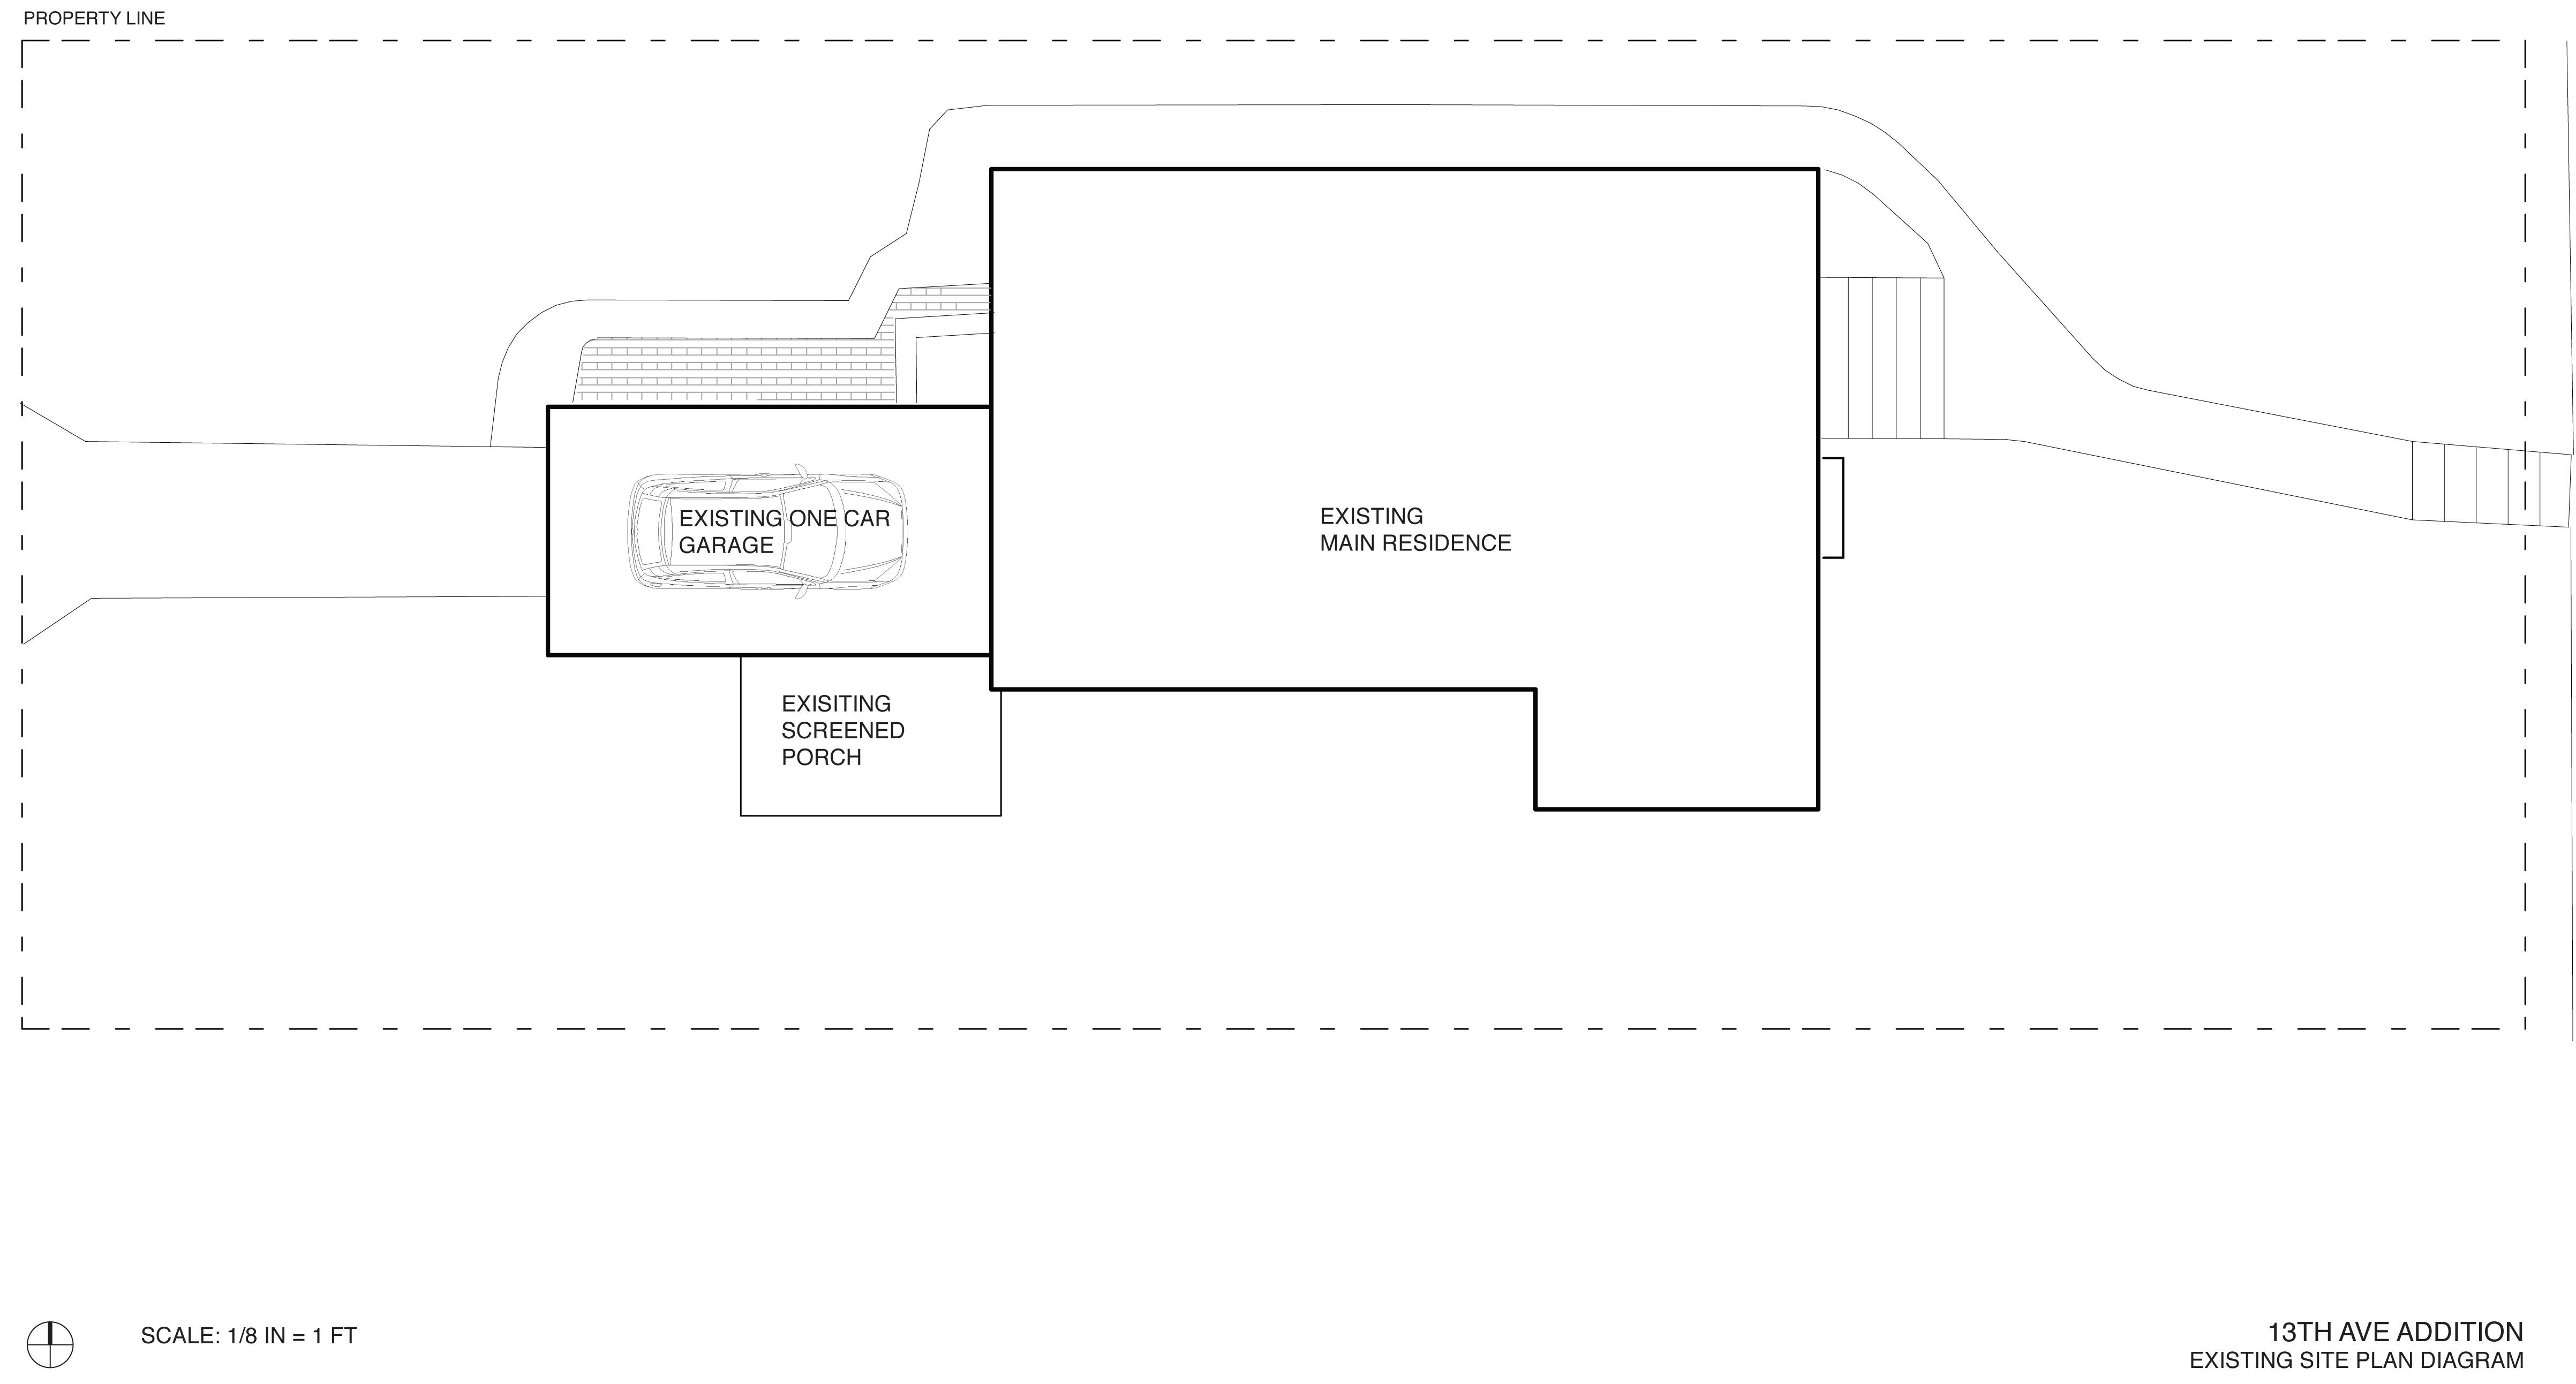 ROMA+Awards_Redstone+Builders_Existing+Plan+Diagram.jpg